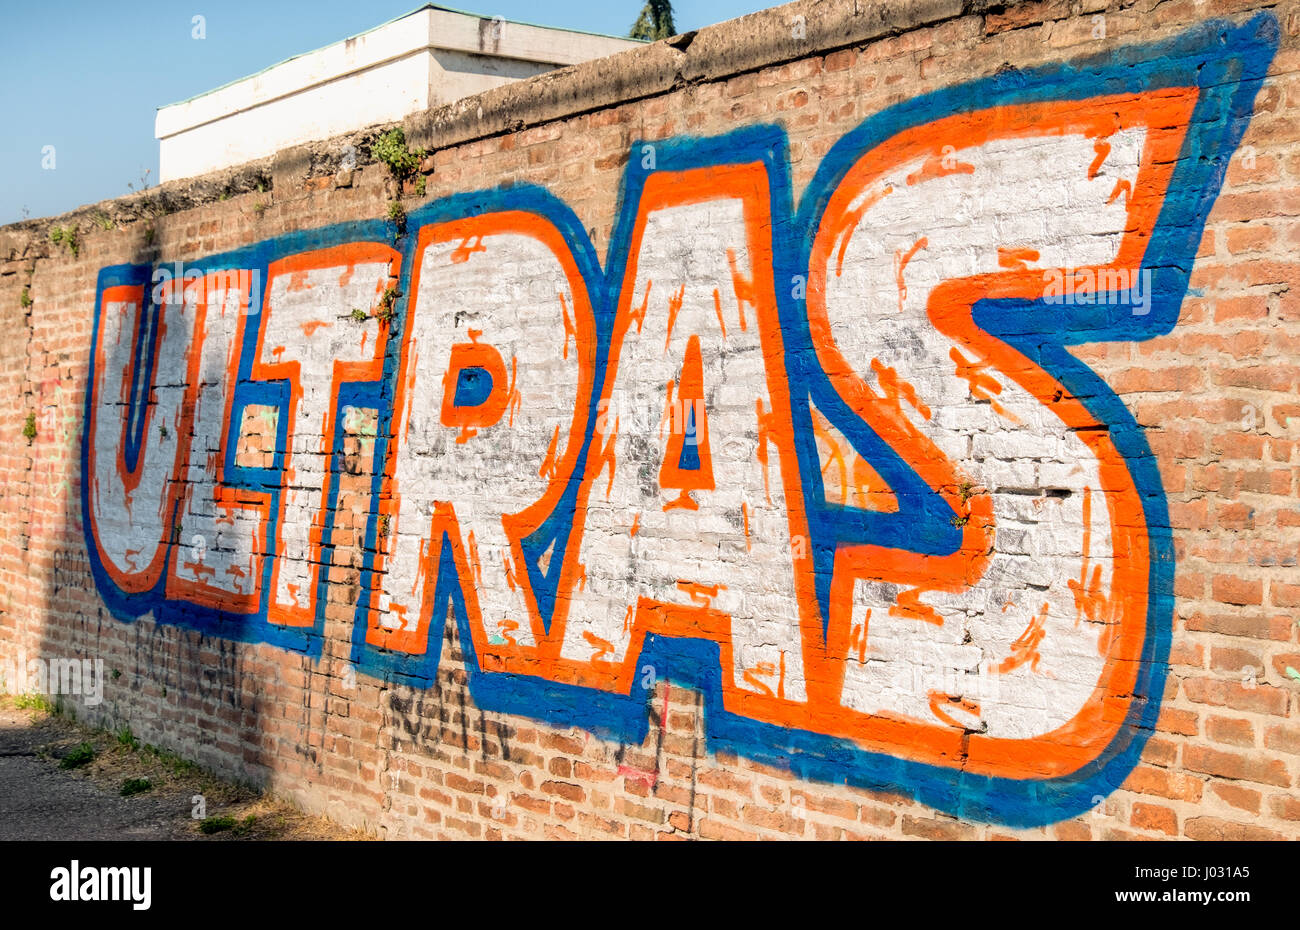 Bologna, Italy, 08 Apr 2017: Ultras football fan graffiti written on a brick wall near the stadium area - Stock Image